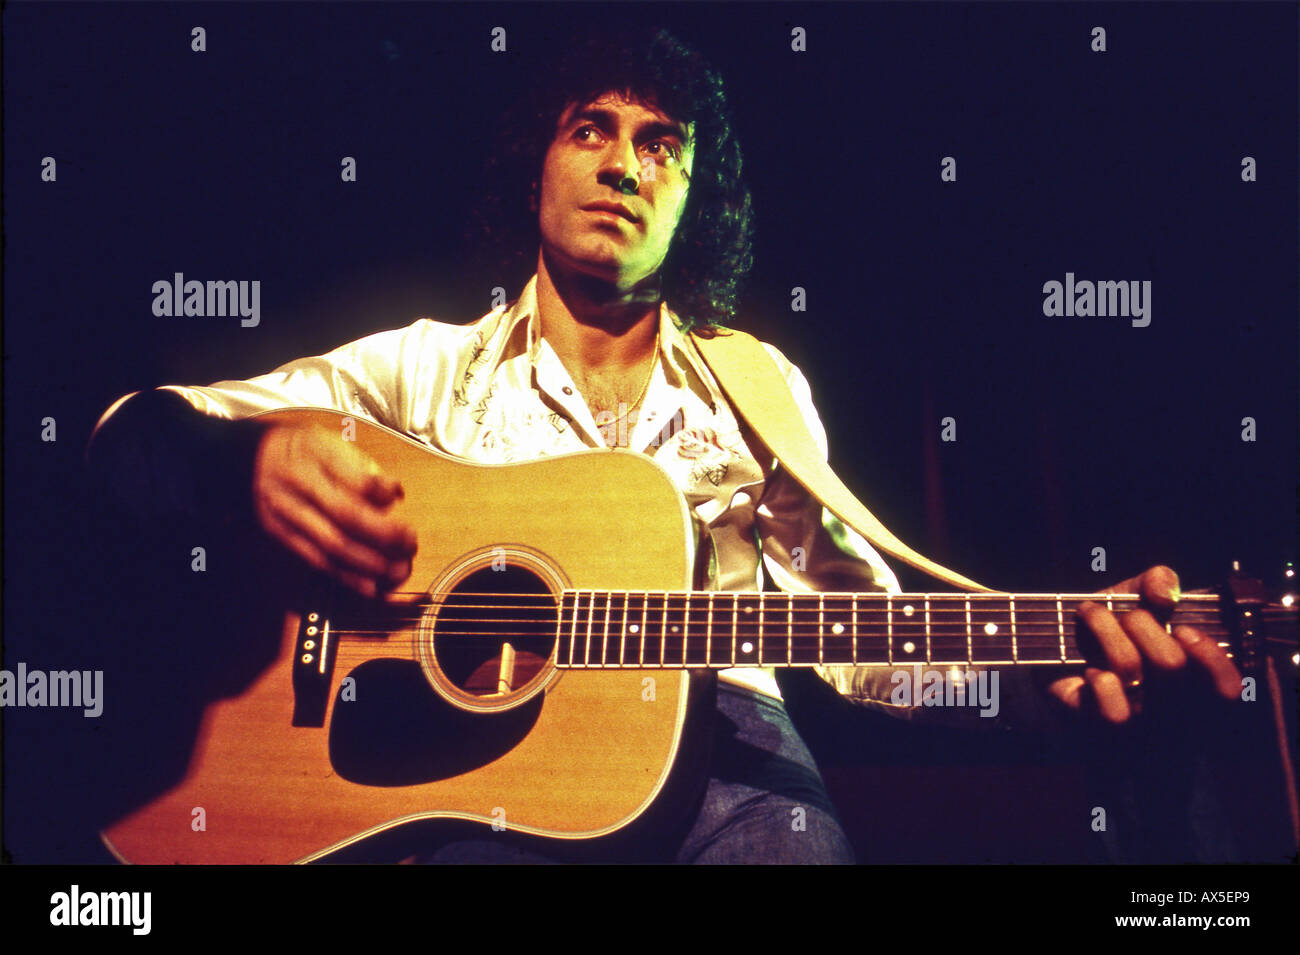 ALBERT HAMMOND UK singer in 1973 - Stock Image